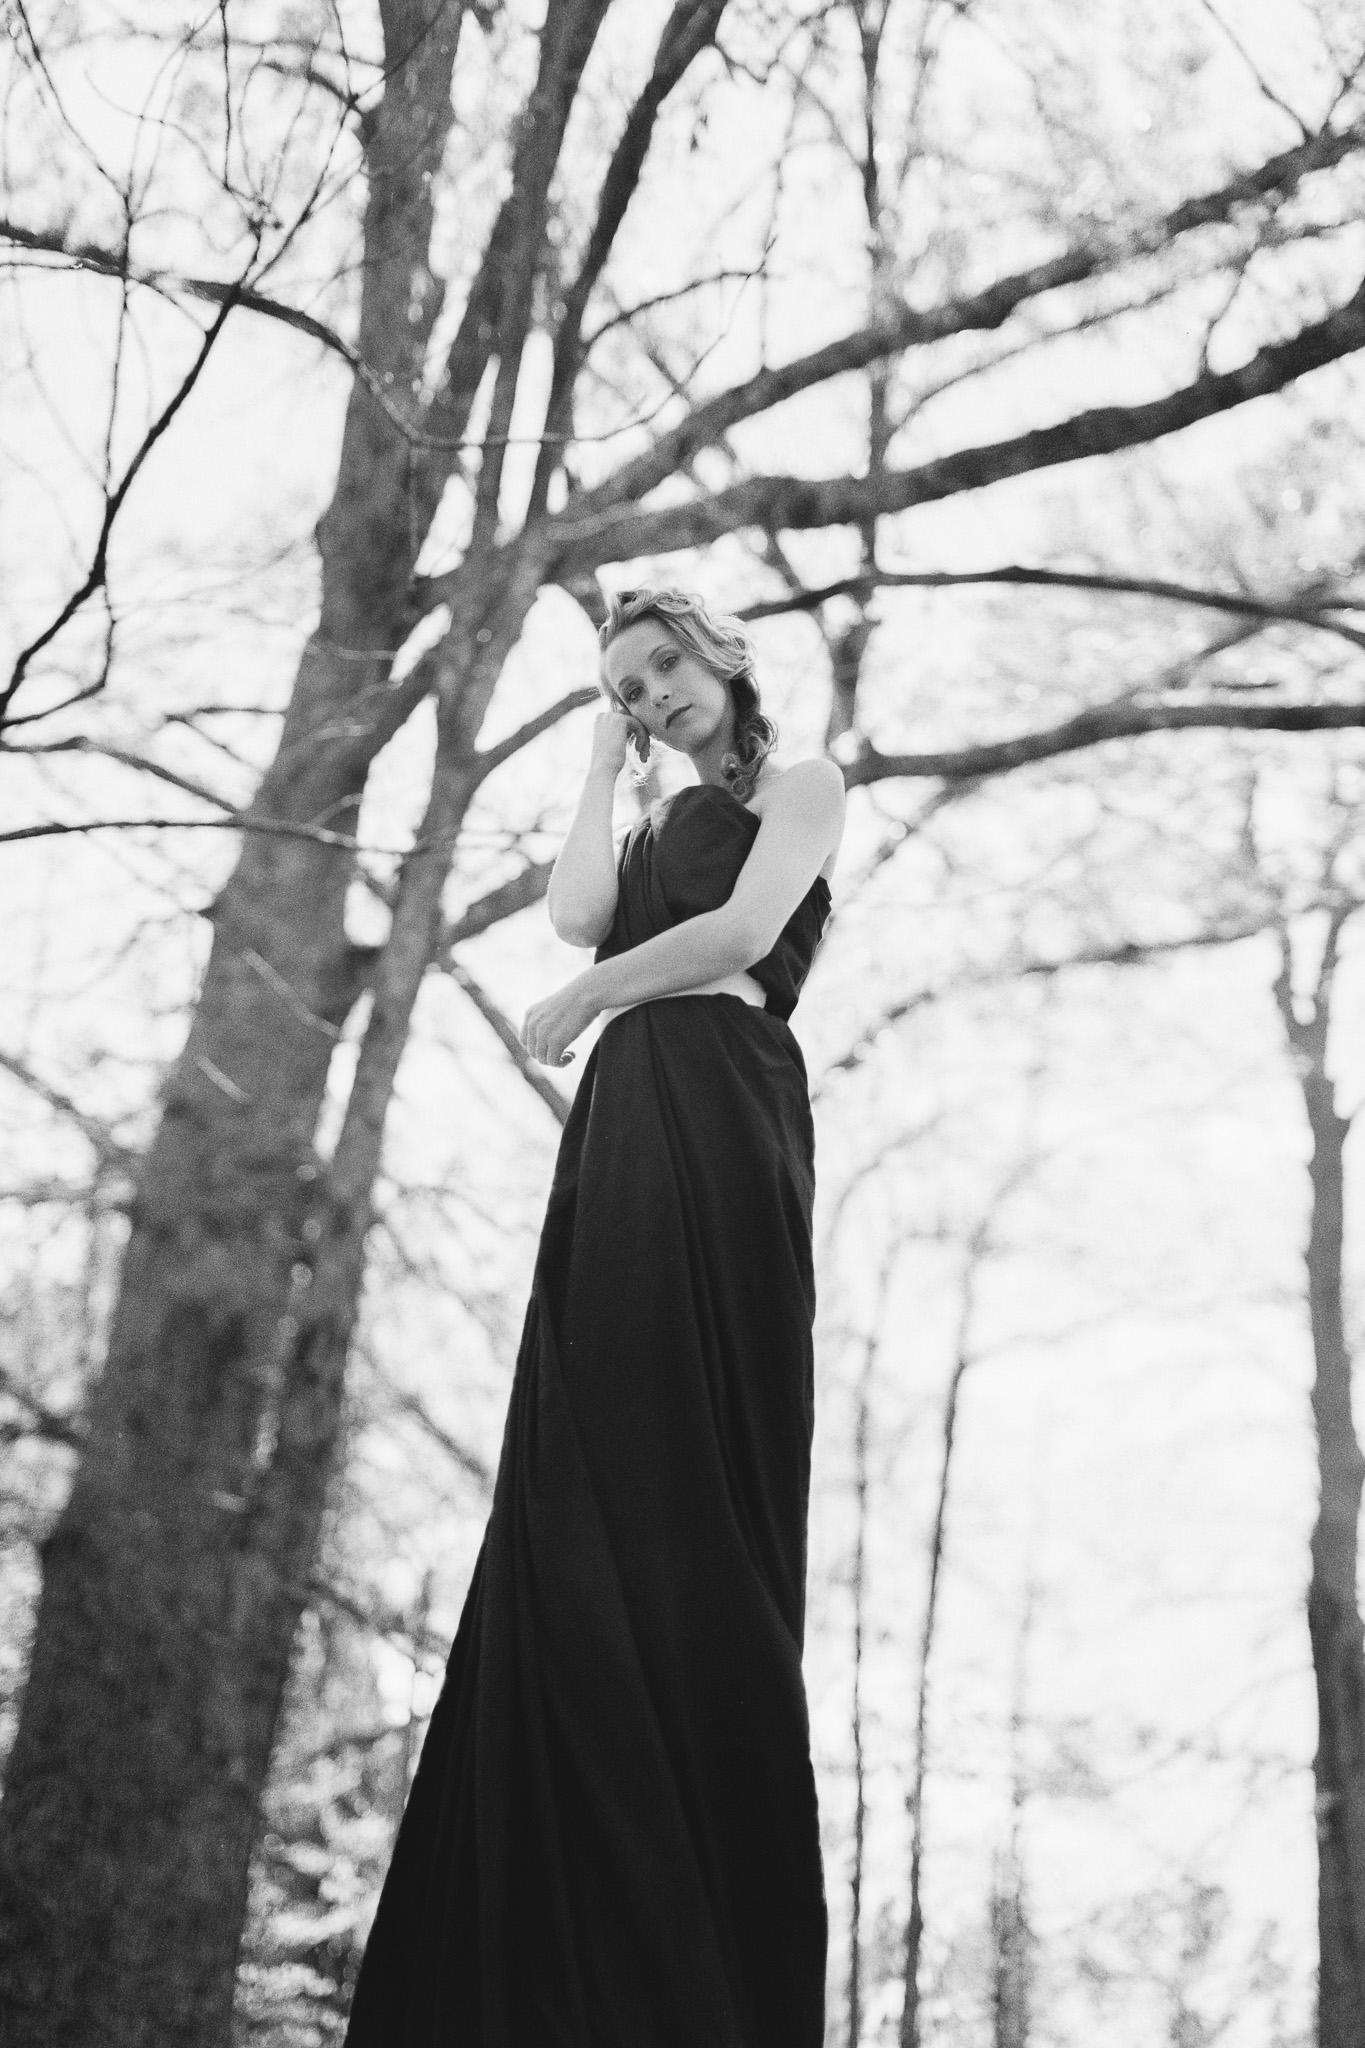 Model: Nicolette Grenier  MUA:Crystal AnnJae Styles  Cameras used: Mamiya 645AFD  Film:Hp5+ 120 medium format